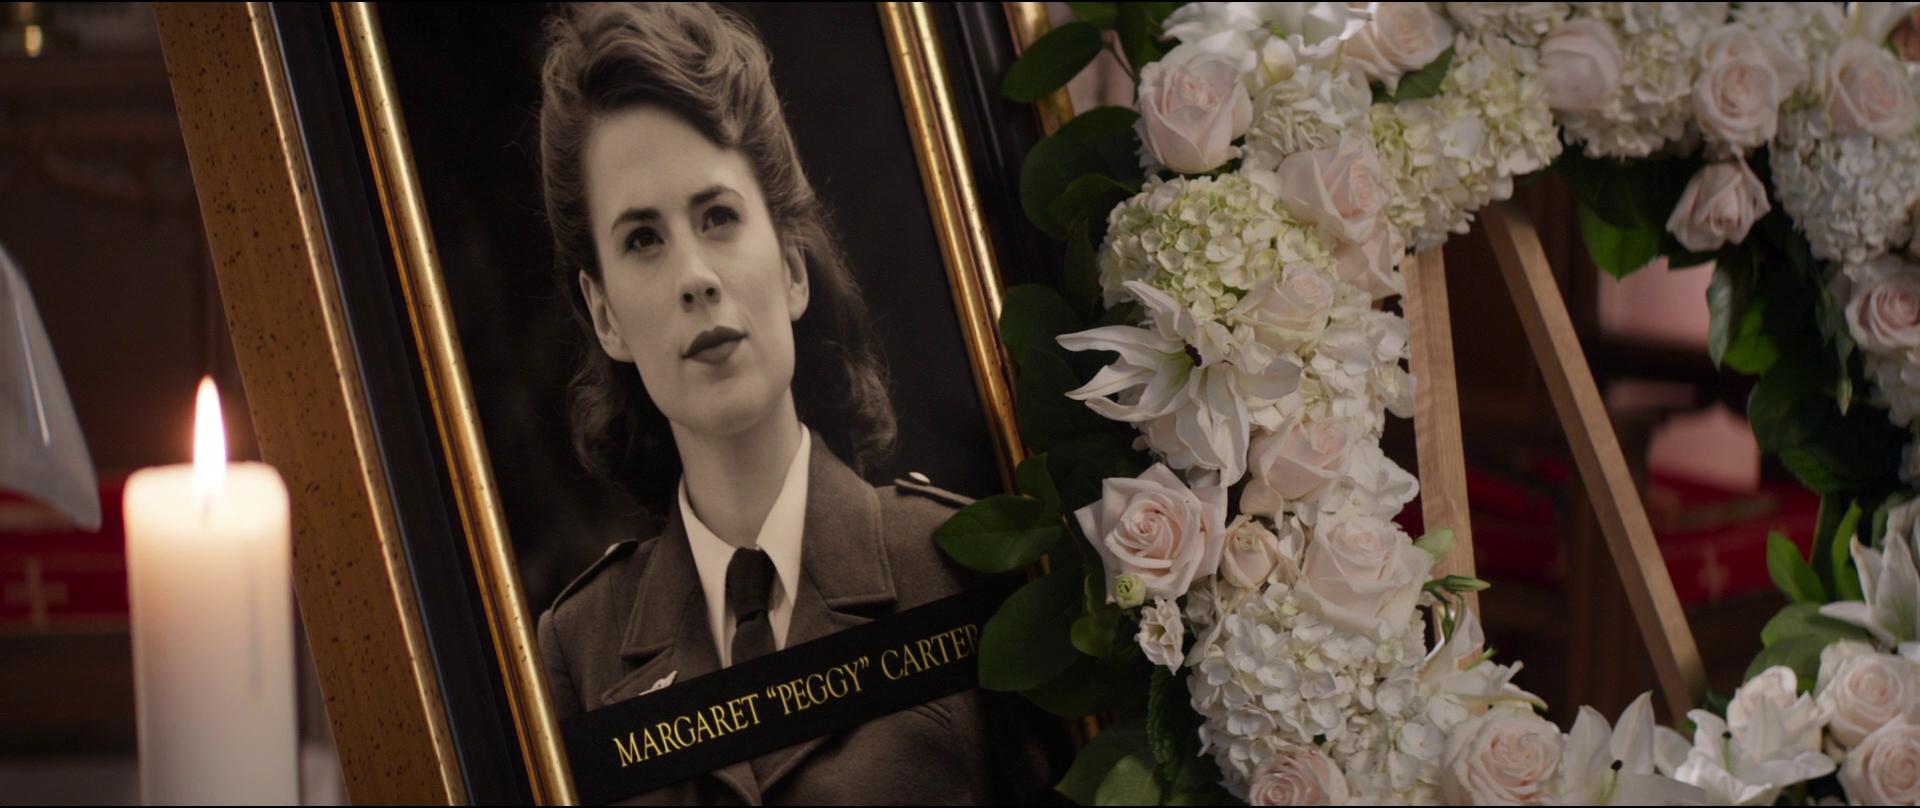 Image margaret peggy carter funeral memorial photog margaret peggy carter funeral memorial photog izmirmasajfo